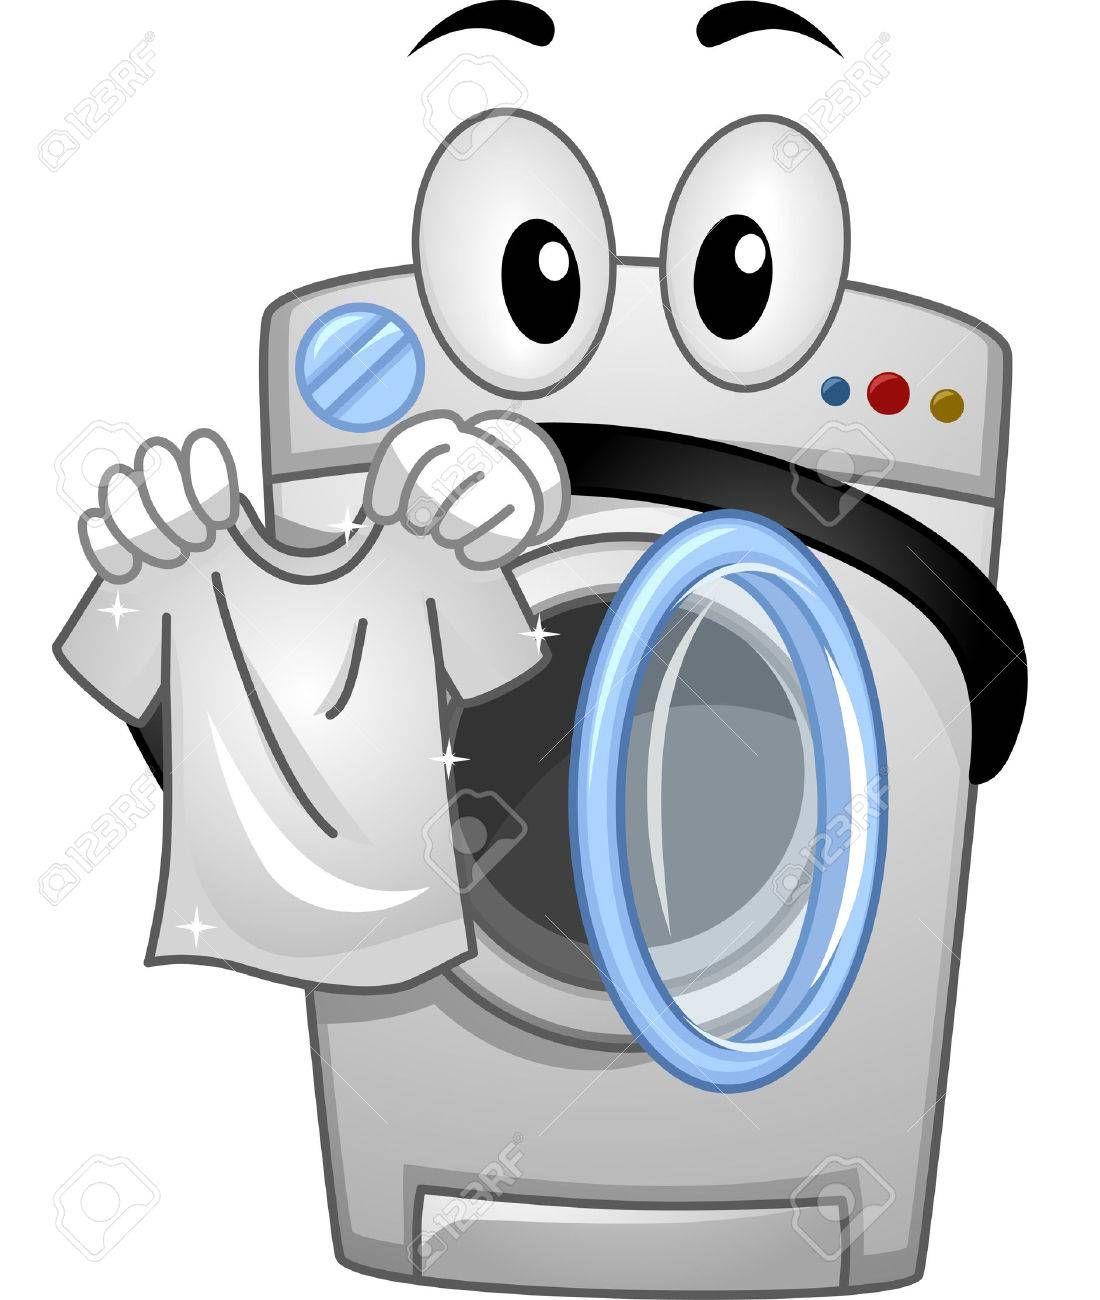 33+ Washing machine clipart cartoon information